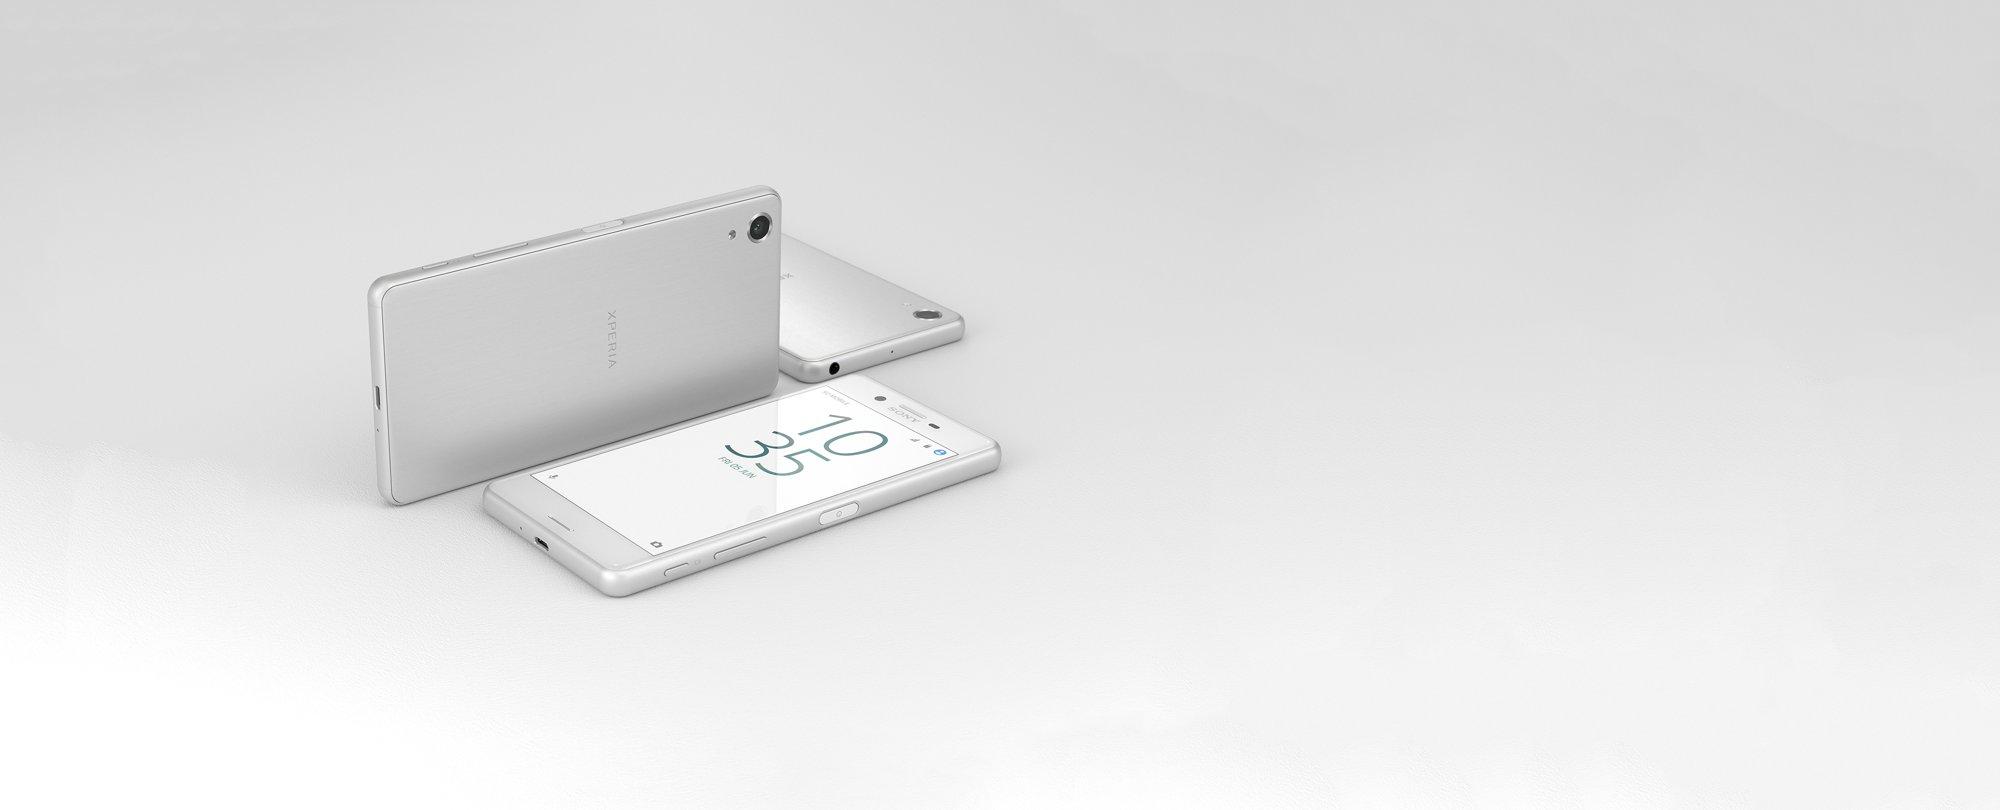 xperia-x-performance-sophisticated-touch-desktop-6c948a5fad102c539acc53d4fa1e3dfe